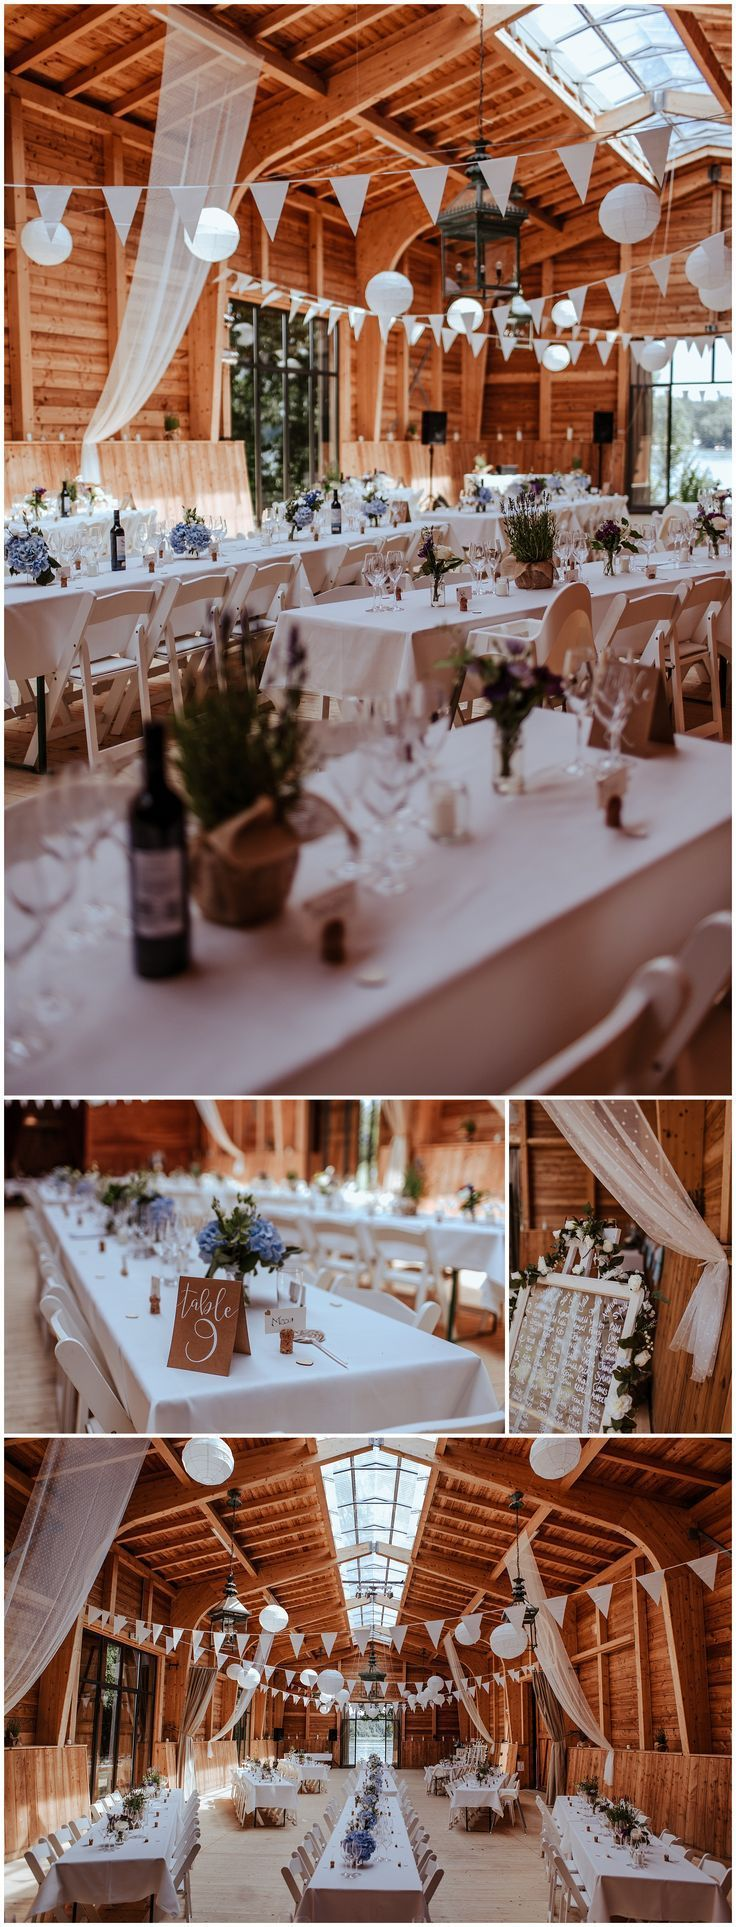 Eibenhof Bad Saarow Hochzeit - Joel und Julia #barnweddings